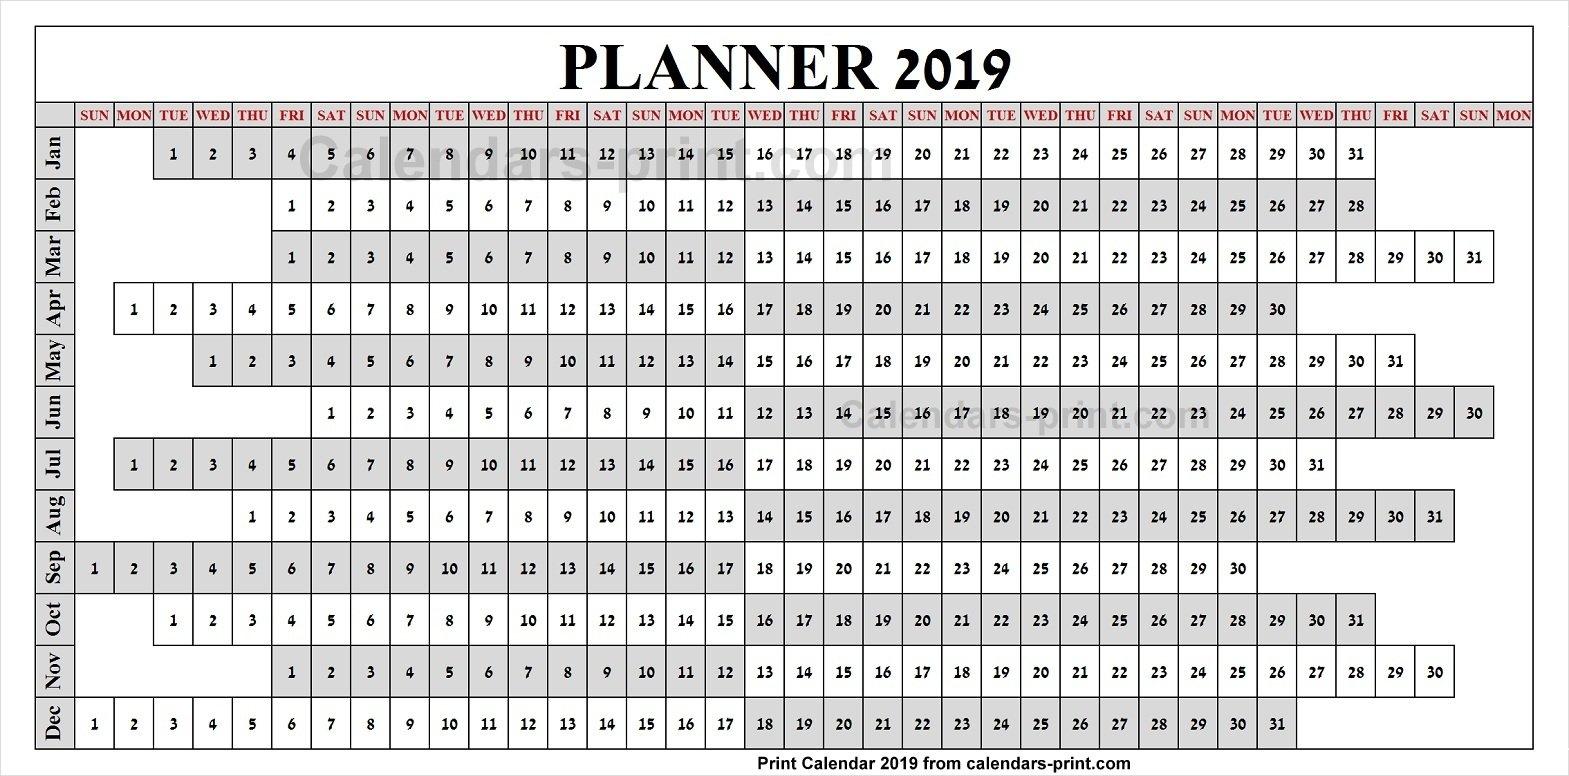 2019 Calendar Year To Print Free | Download Blank Pdf Template Calendar 2019 Za Printanje